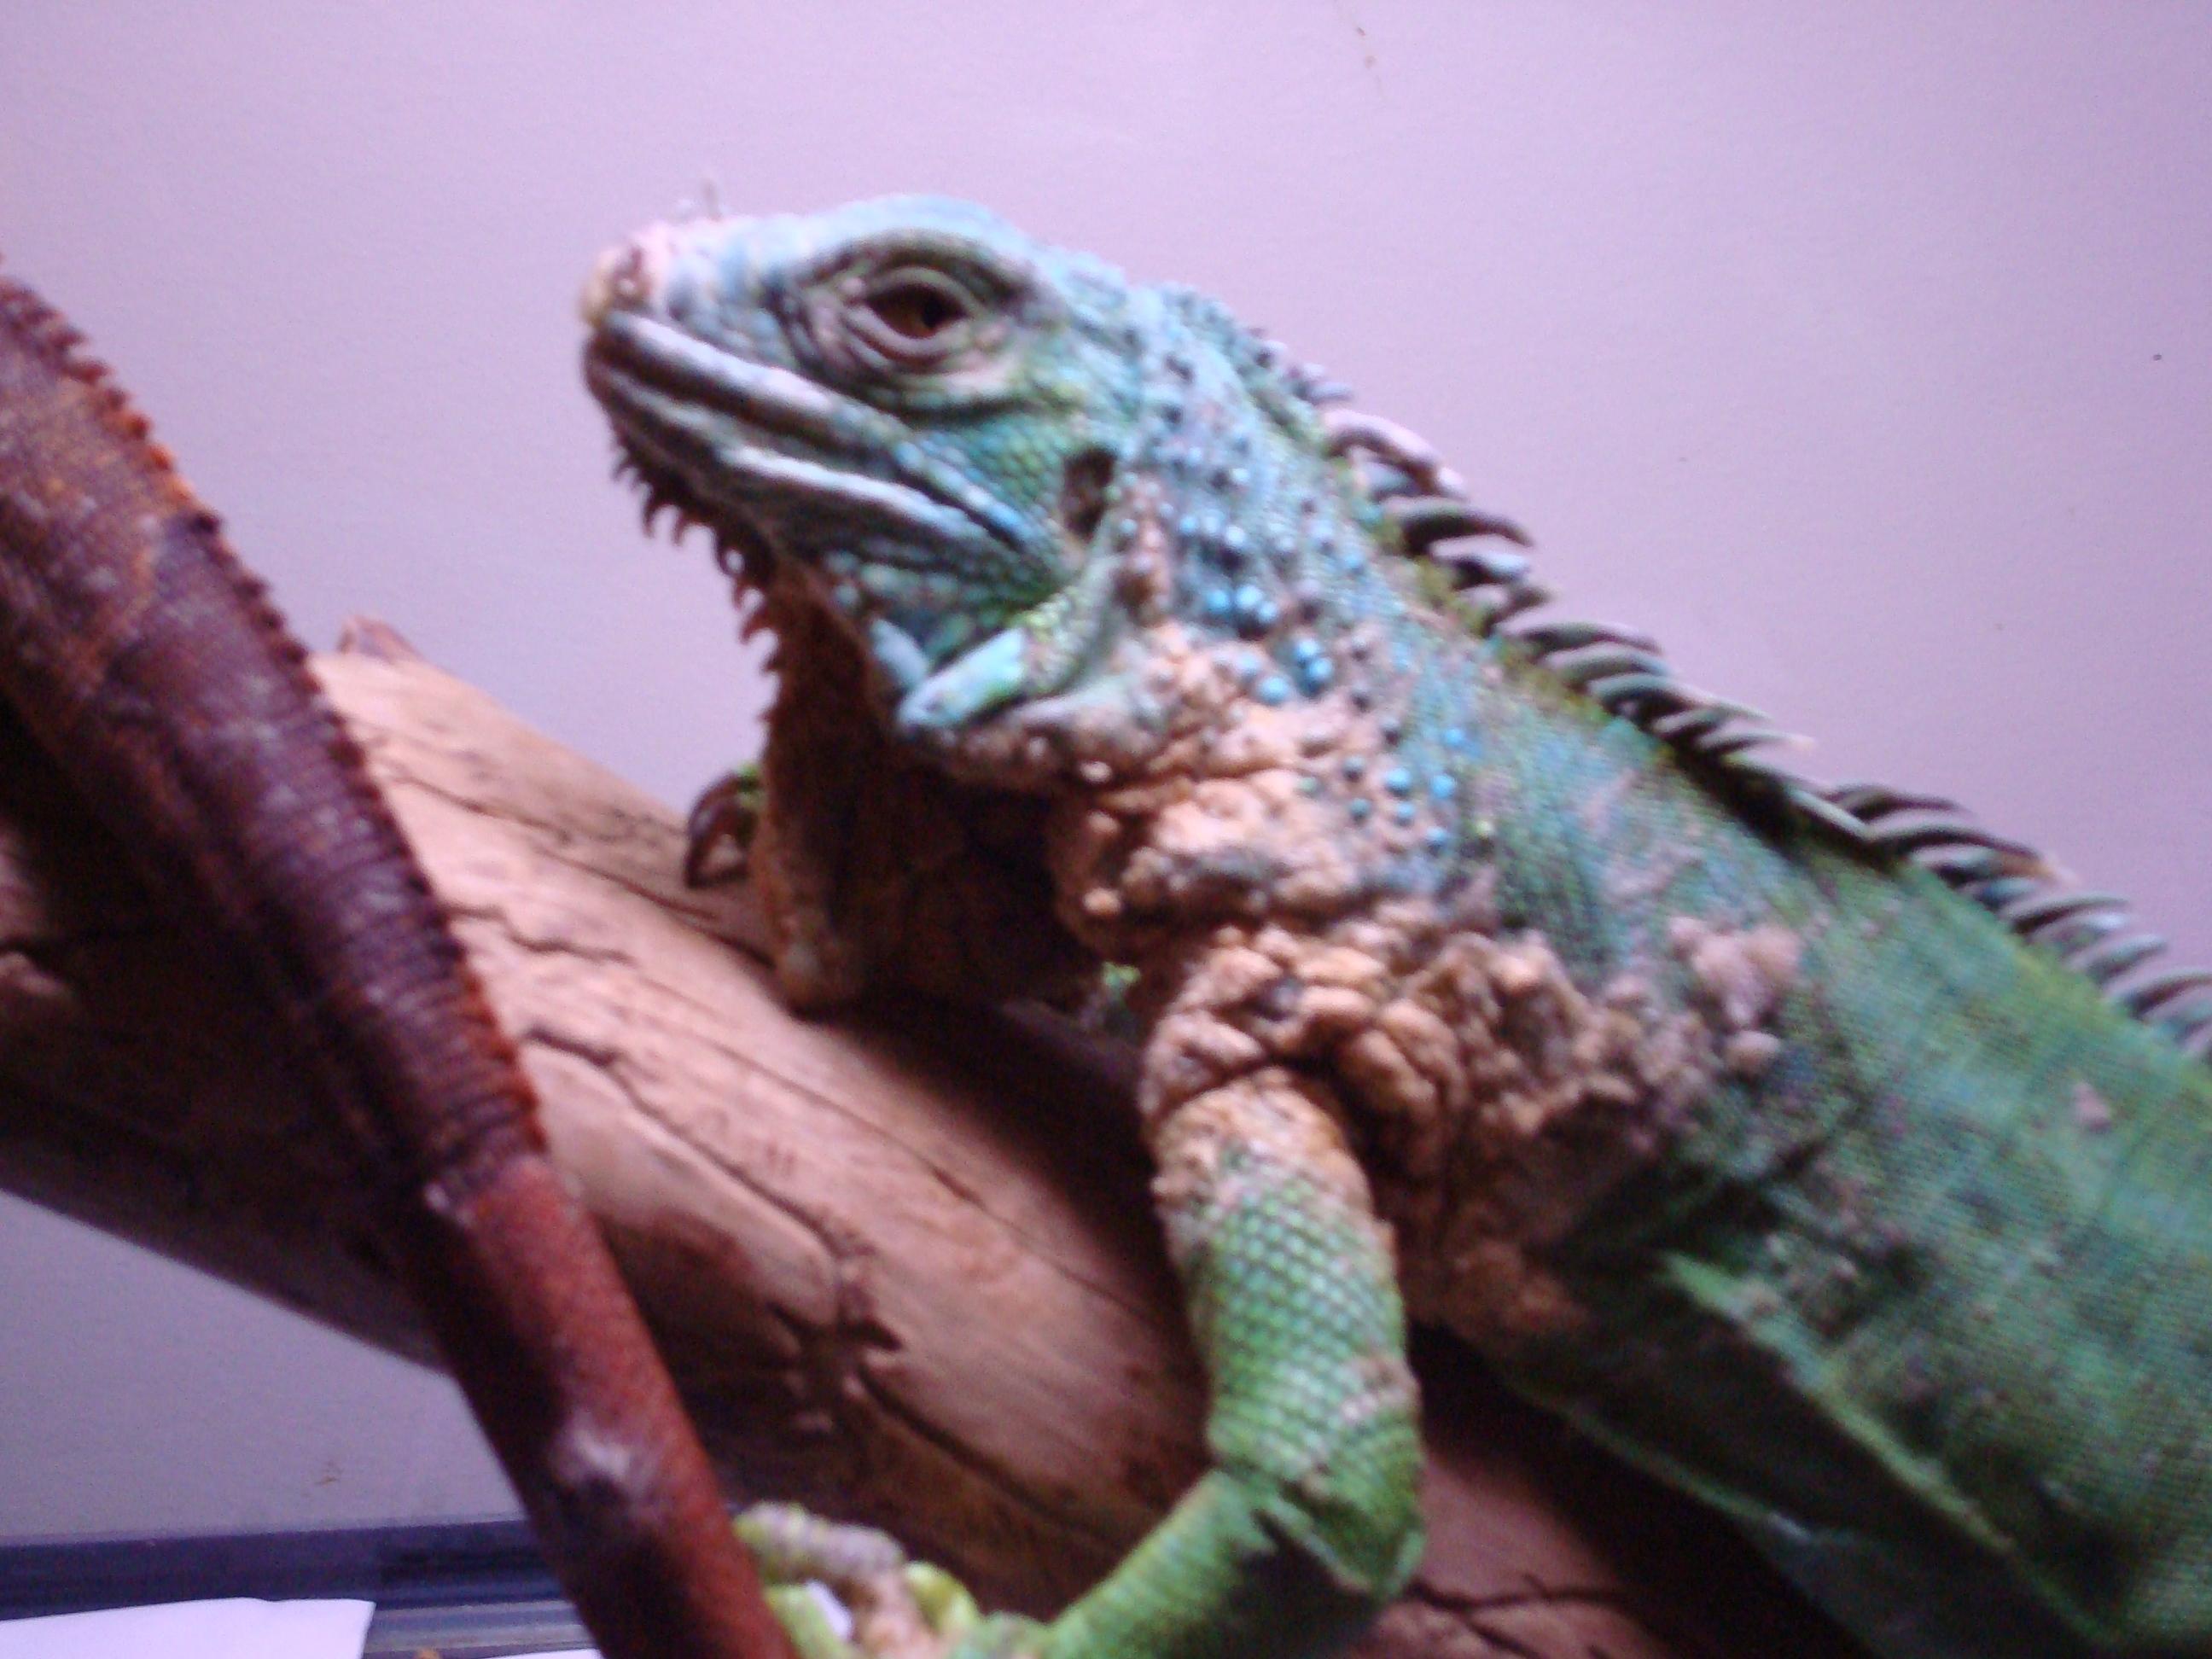 i have a iguana with a brownish